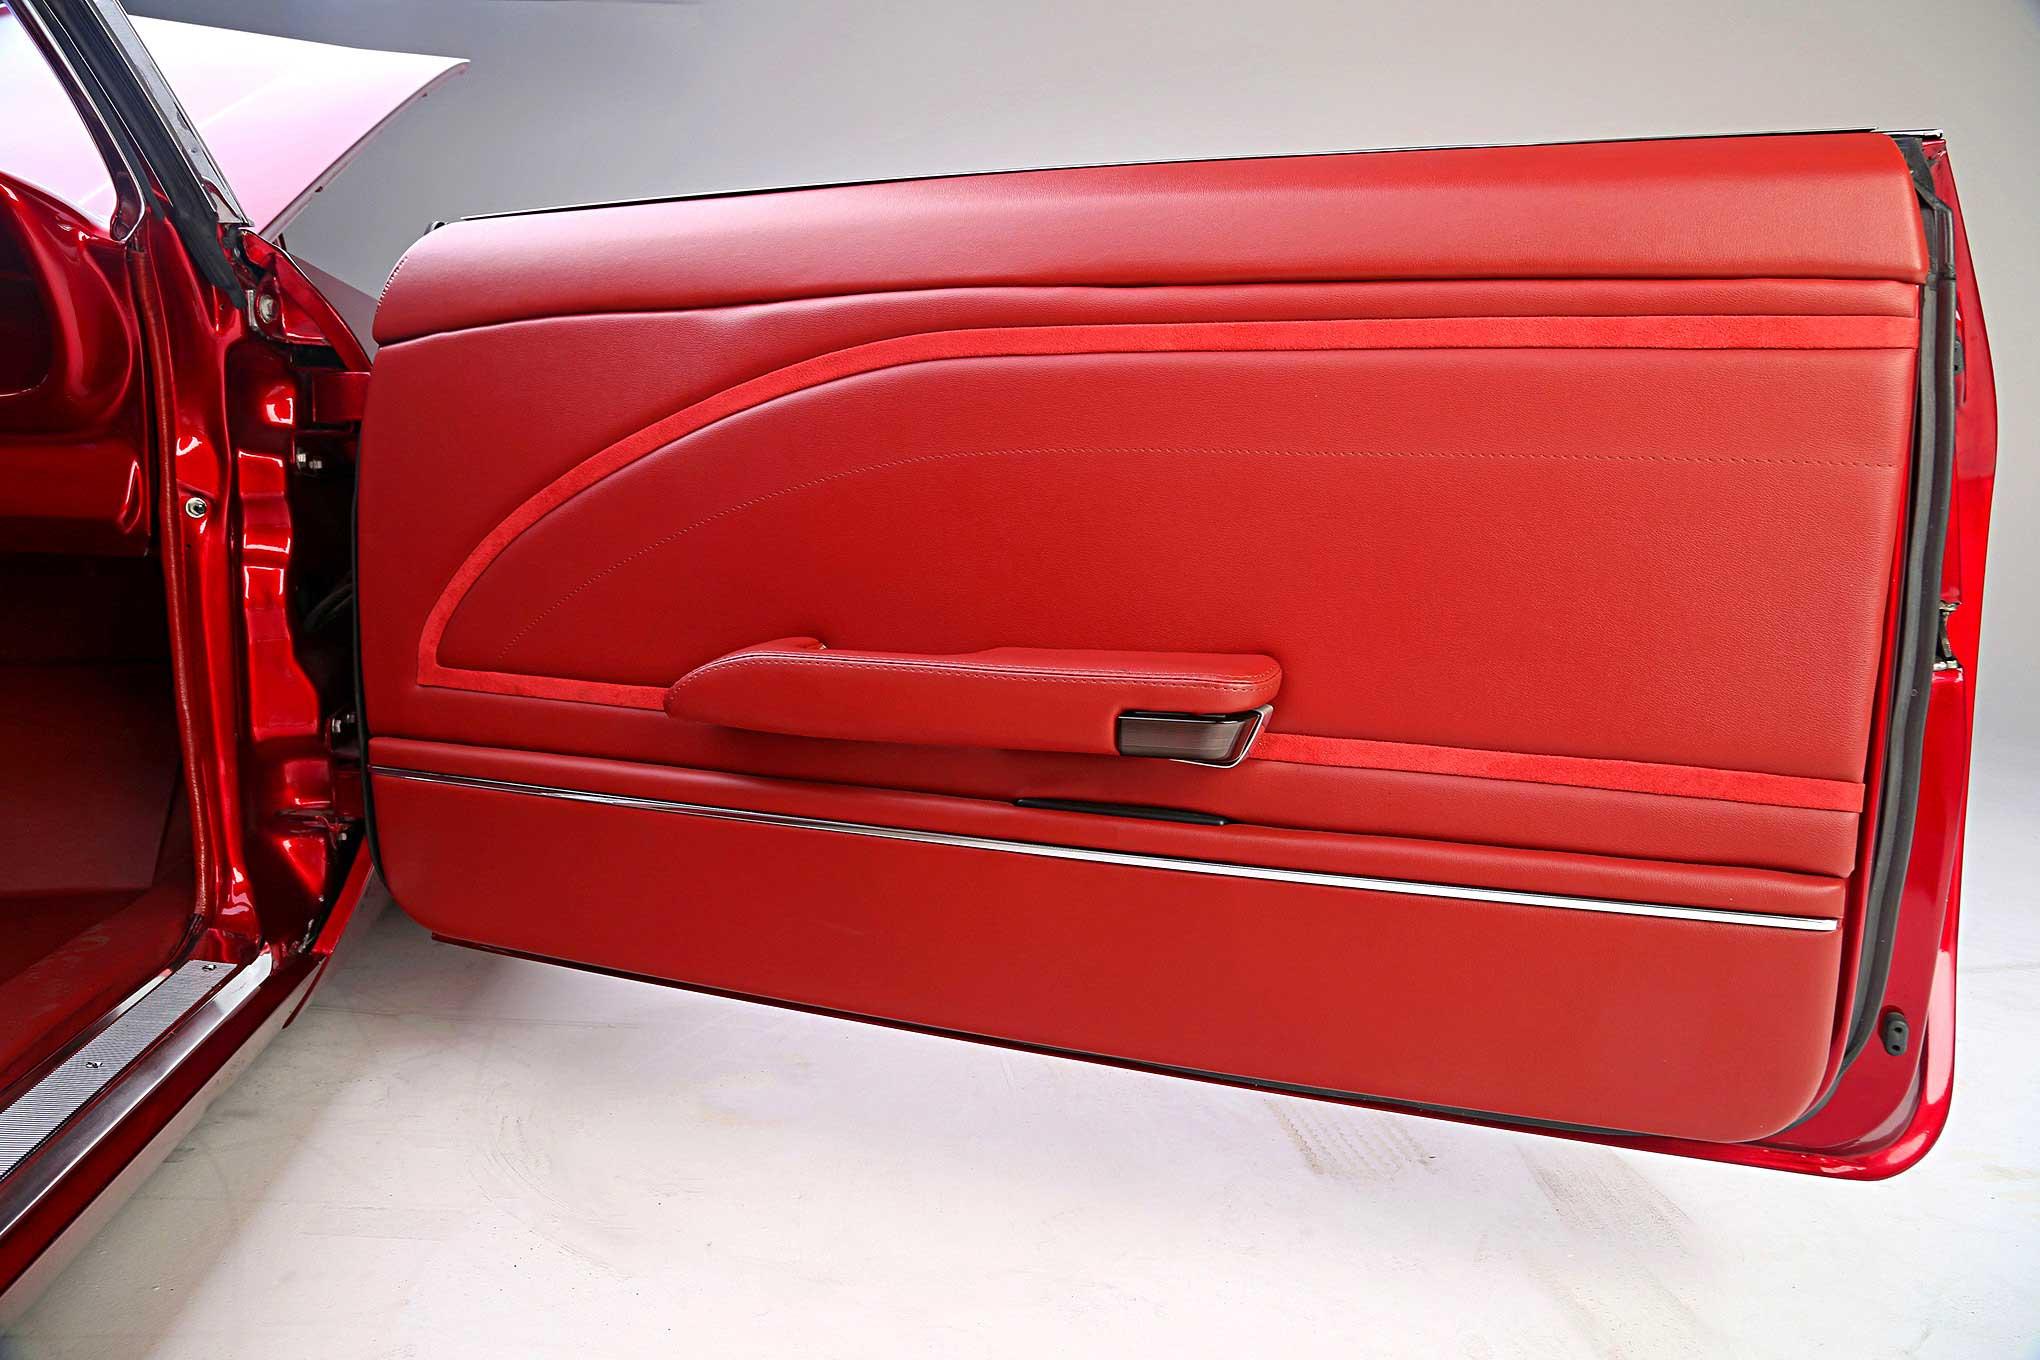 1965 Chevrolet Impala Door Panel Lowrider